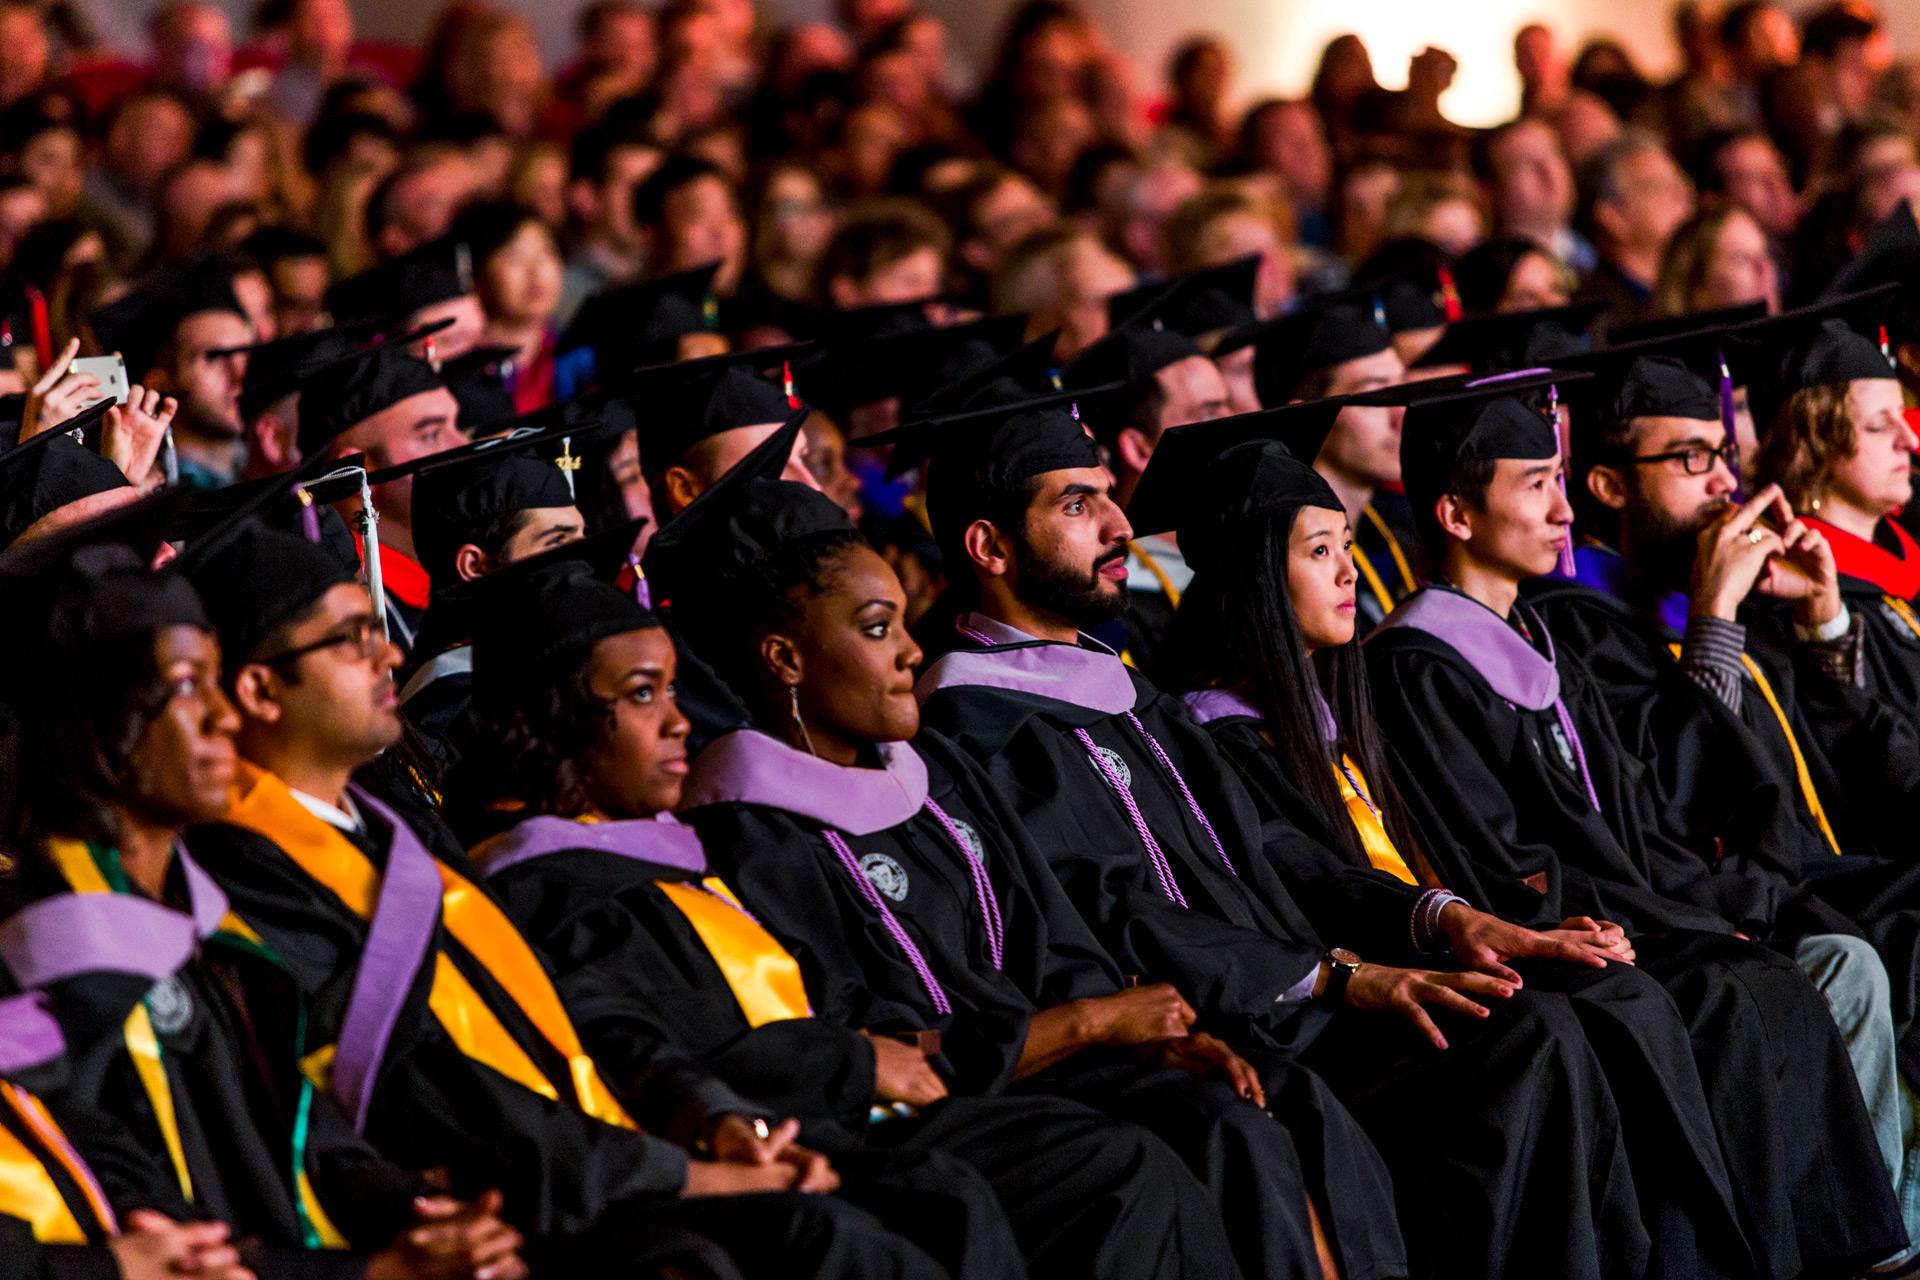 Congratulations, graduates! SCAD commencement in pictures | SCAD.edu